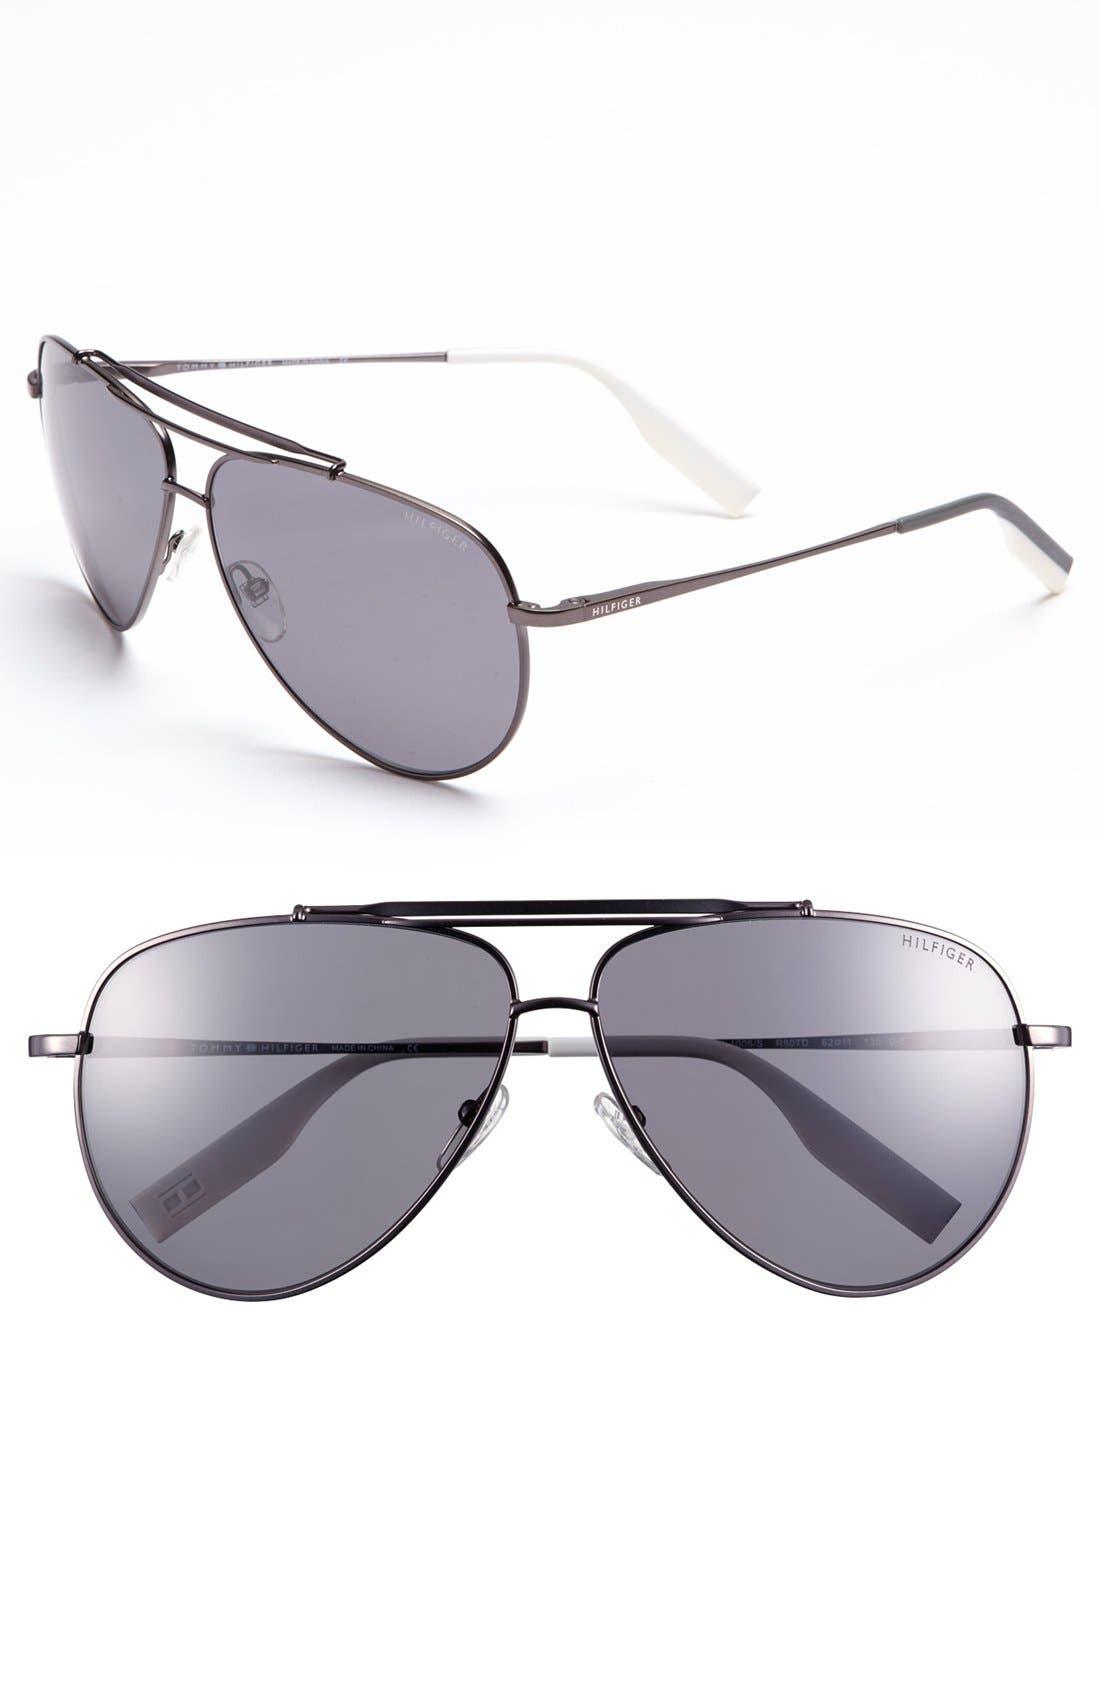 Main Image - Tommy Hilfiger 62mm Polarized Aviator Sunglasses